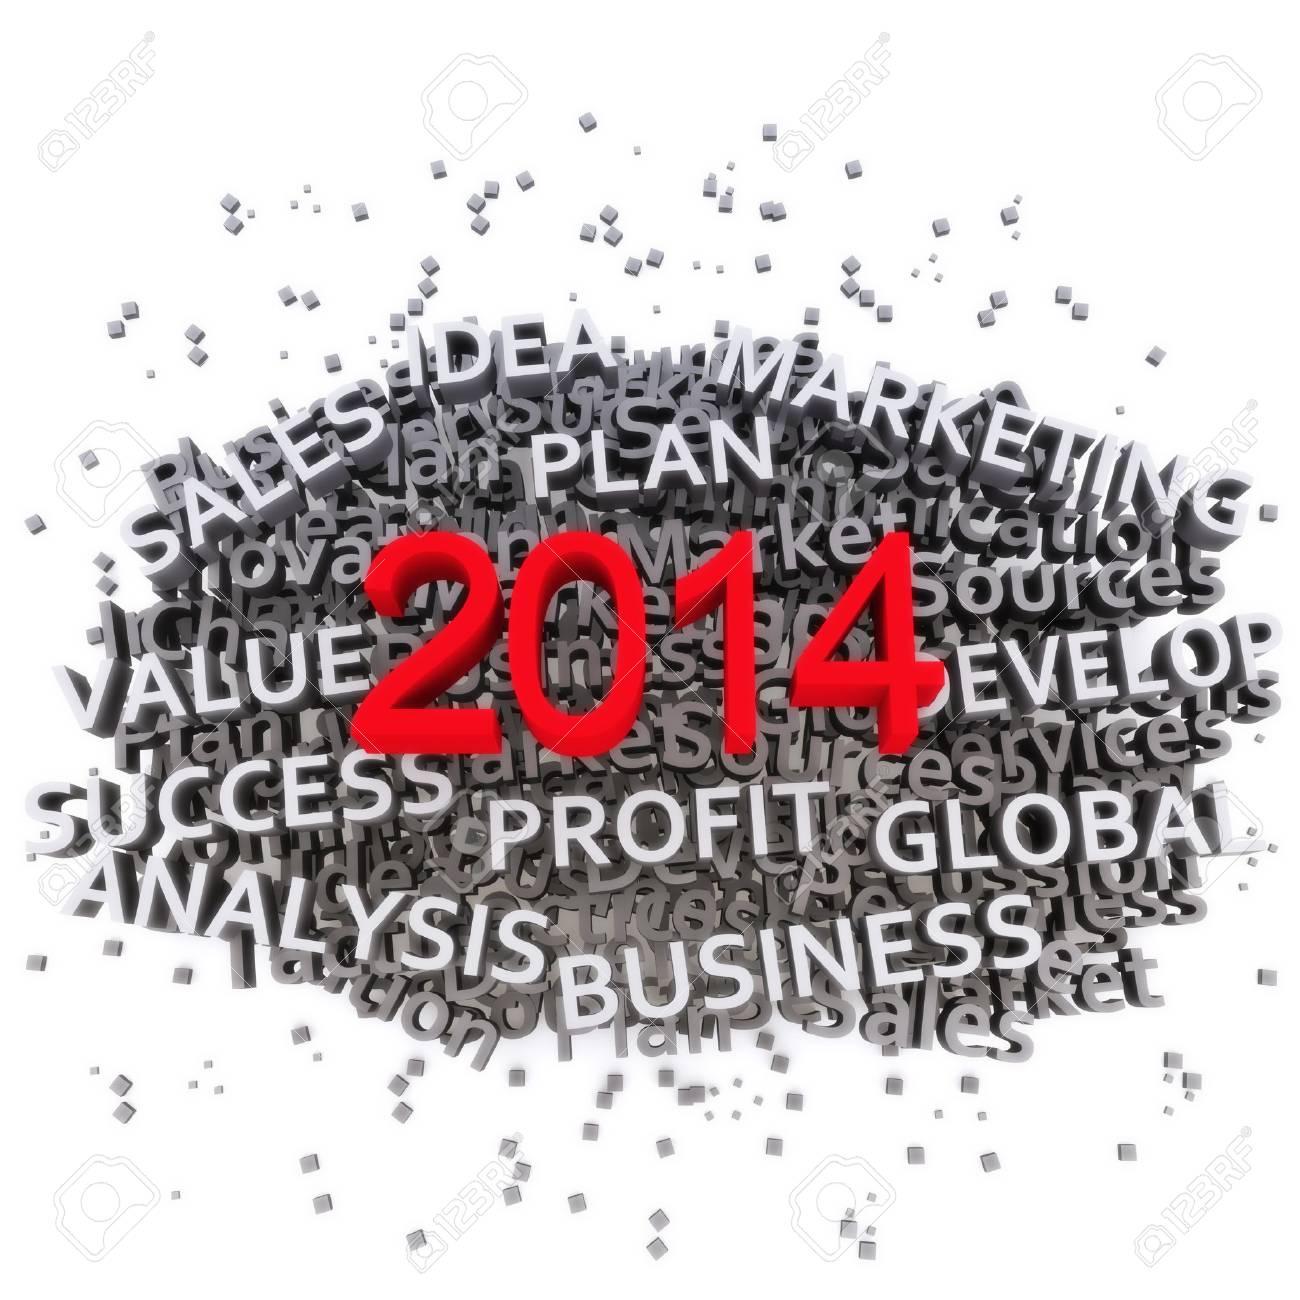 2014 Business plan Stock Photo - 19296565